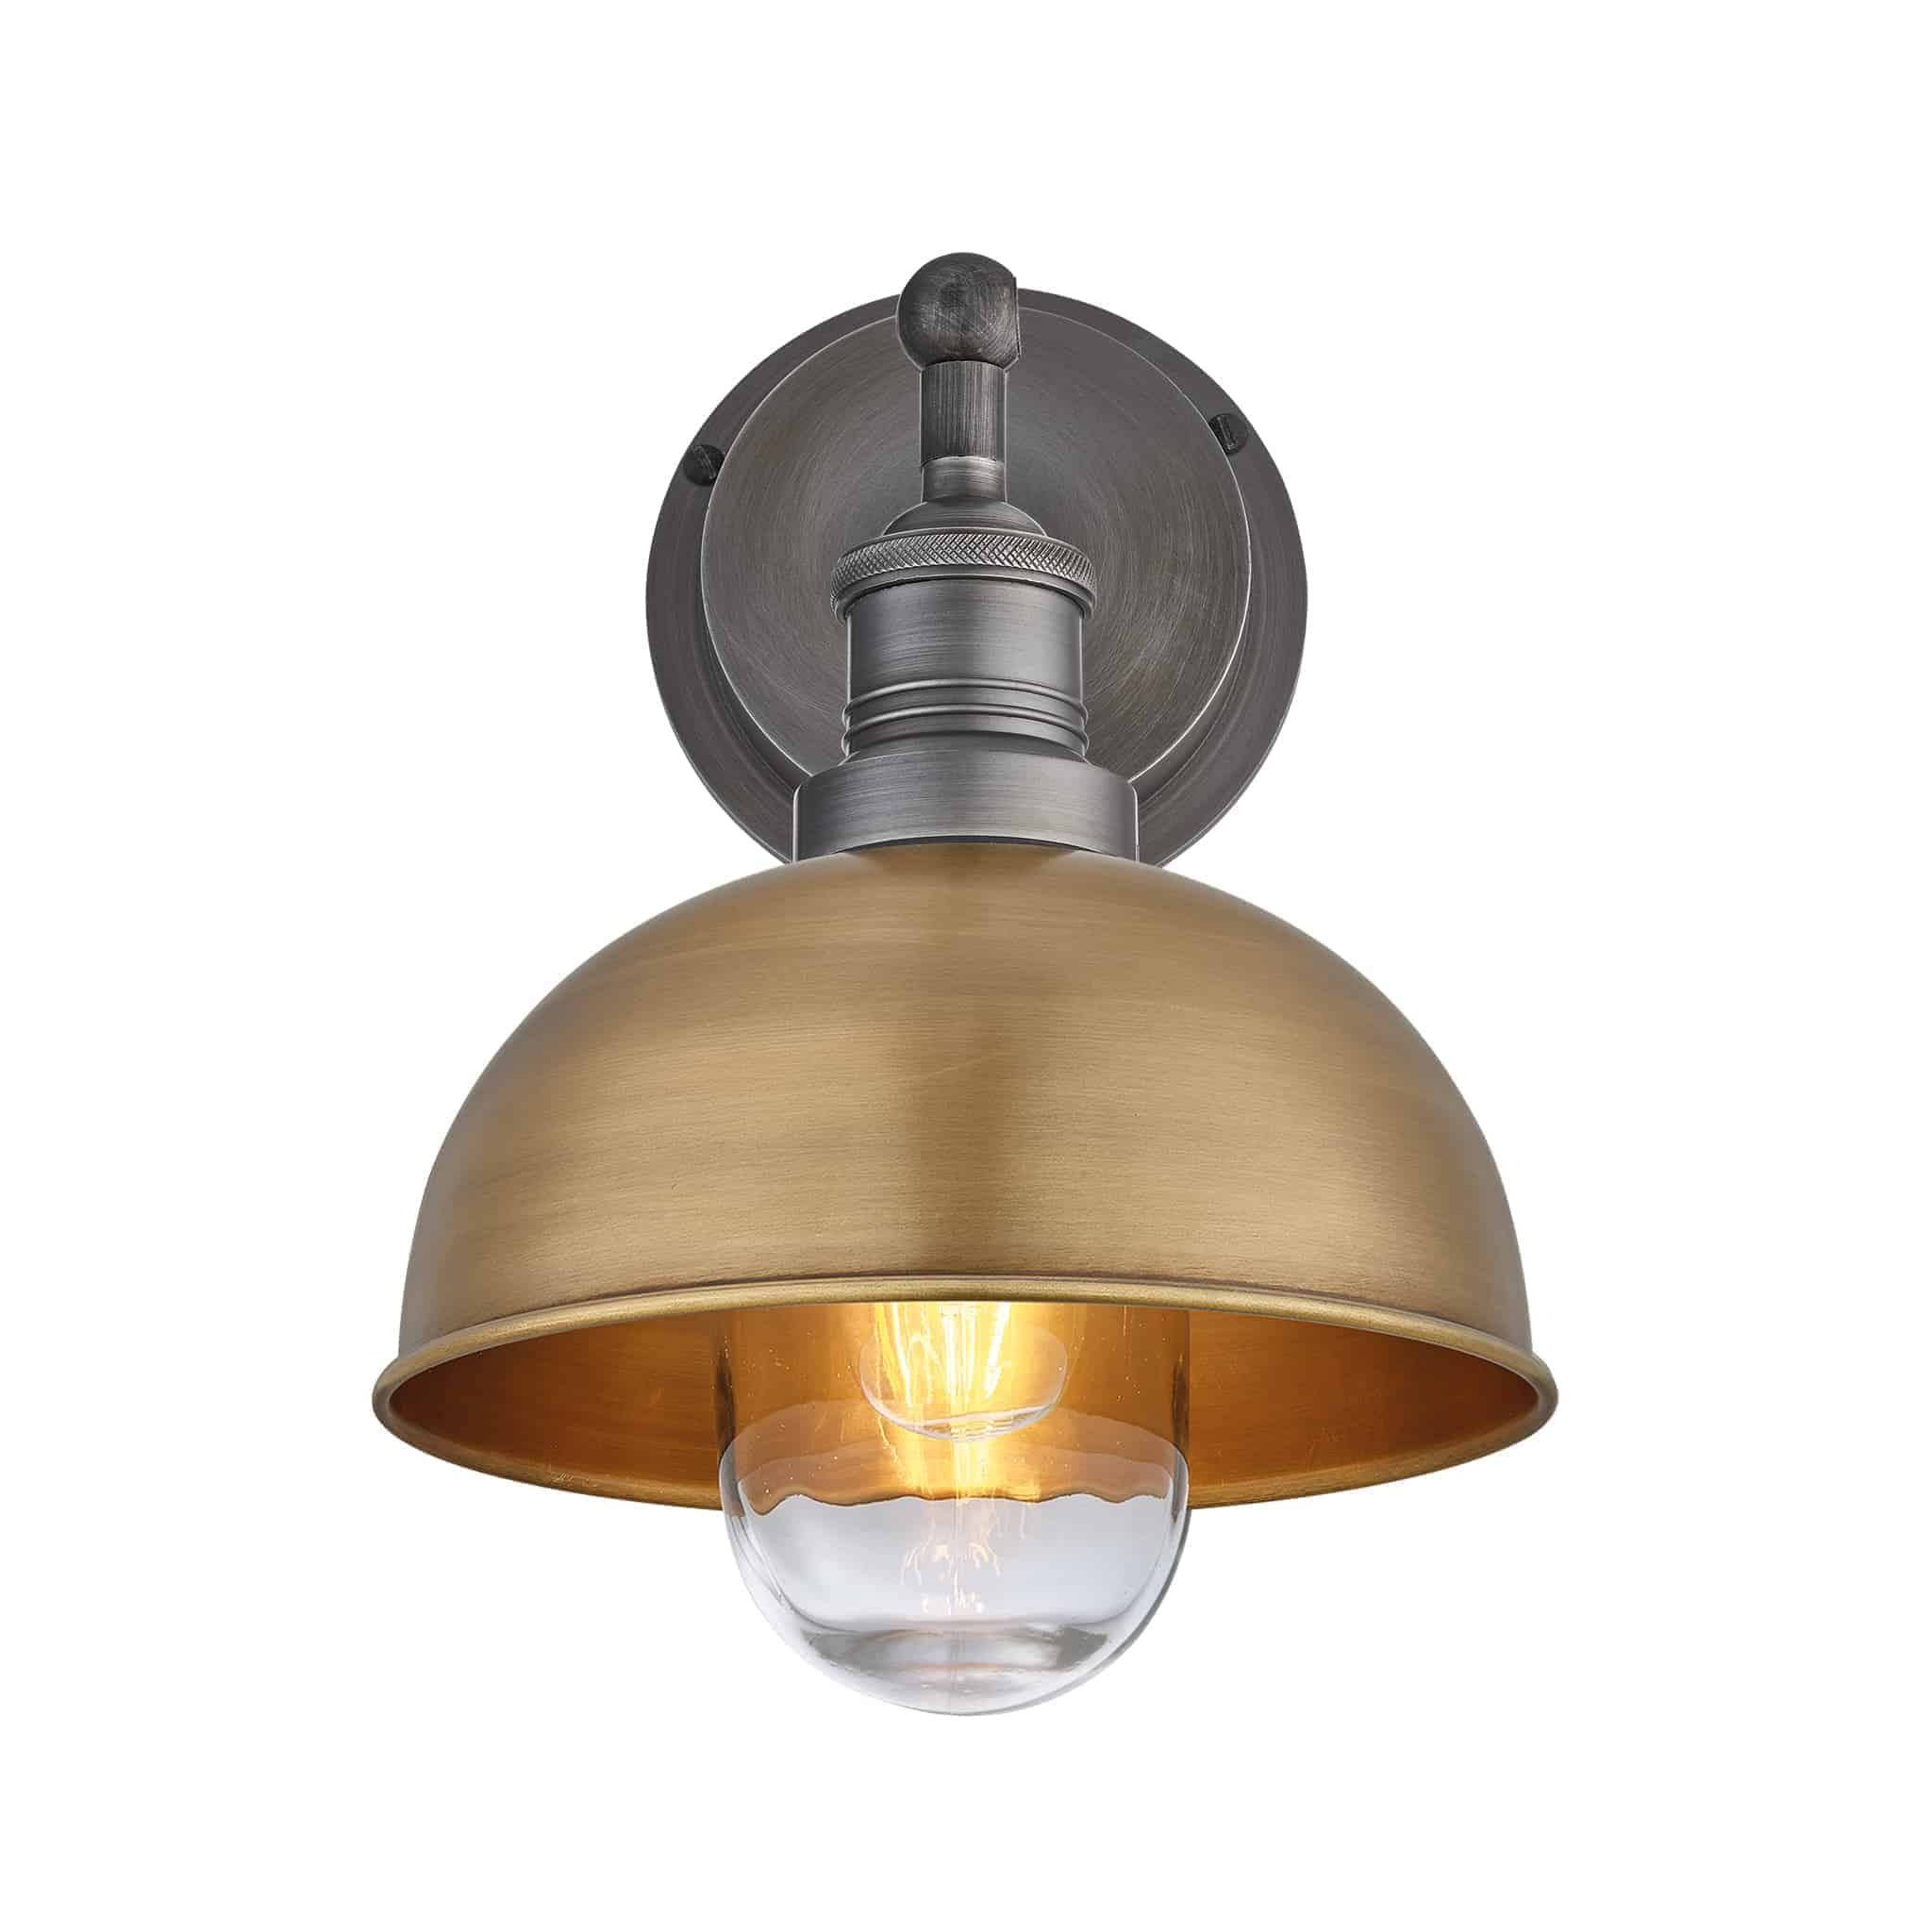 Industville BR-IP65-DWL8-B-PH IP65 Wall Light